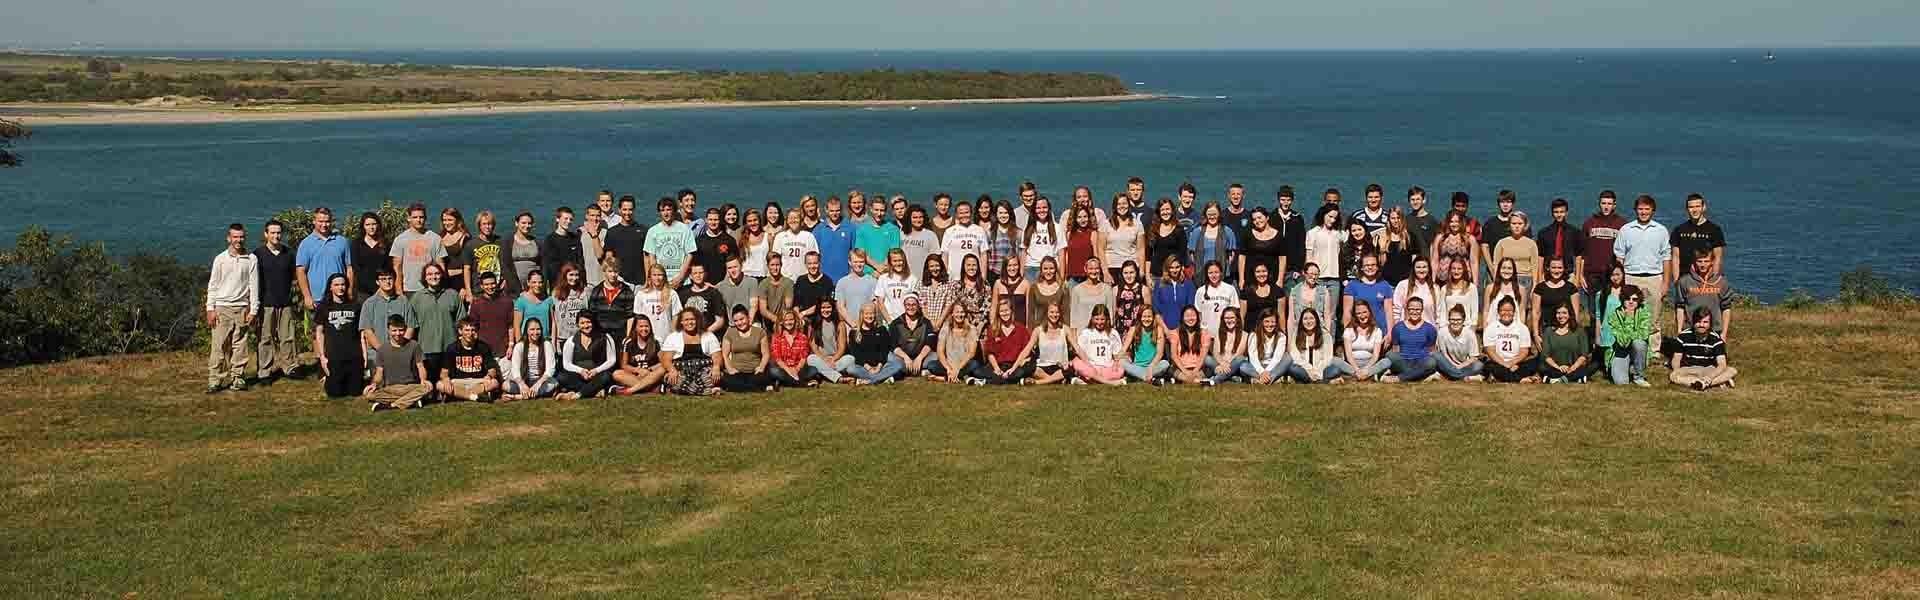 Ipswich High School MA USA Students Crane Estate Banner 2019